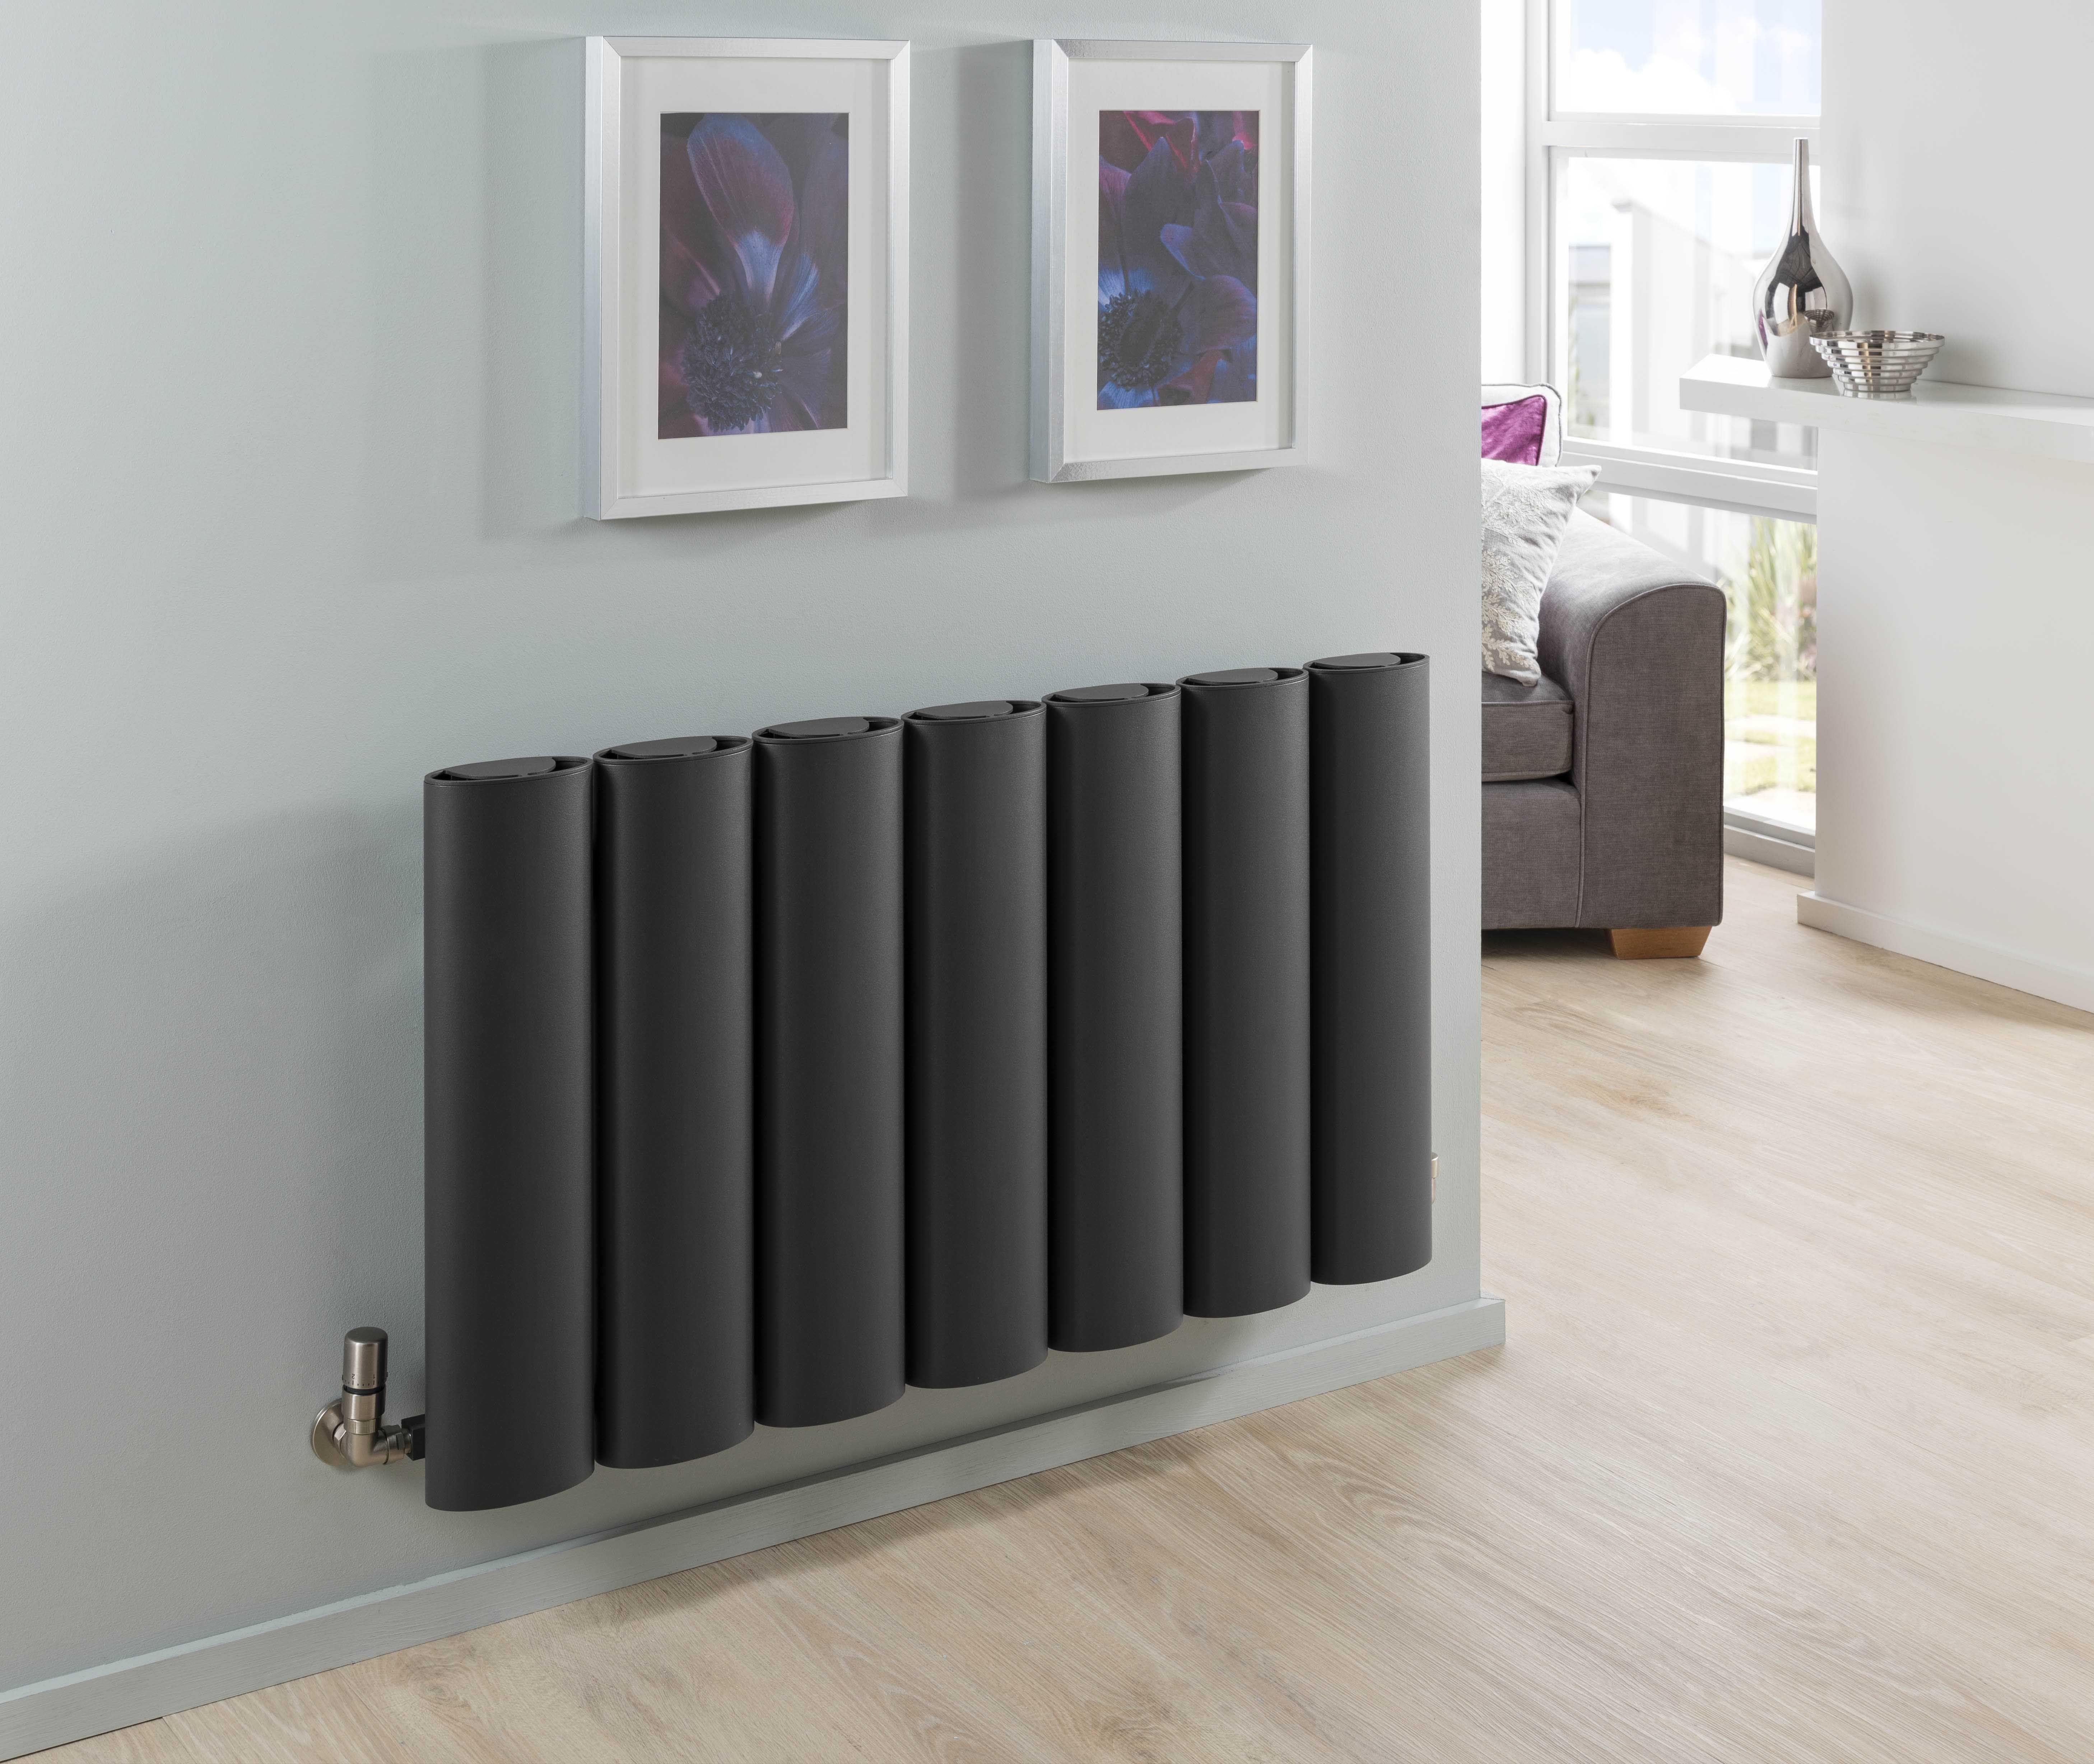 The Radiator Company Ovali Horizontal radiator this